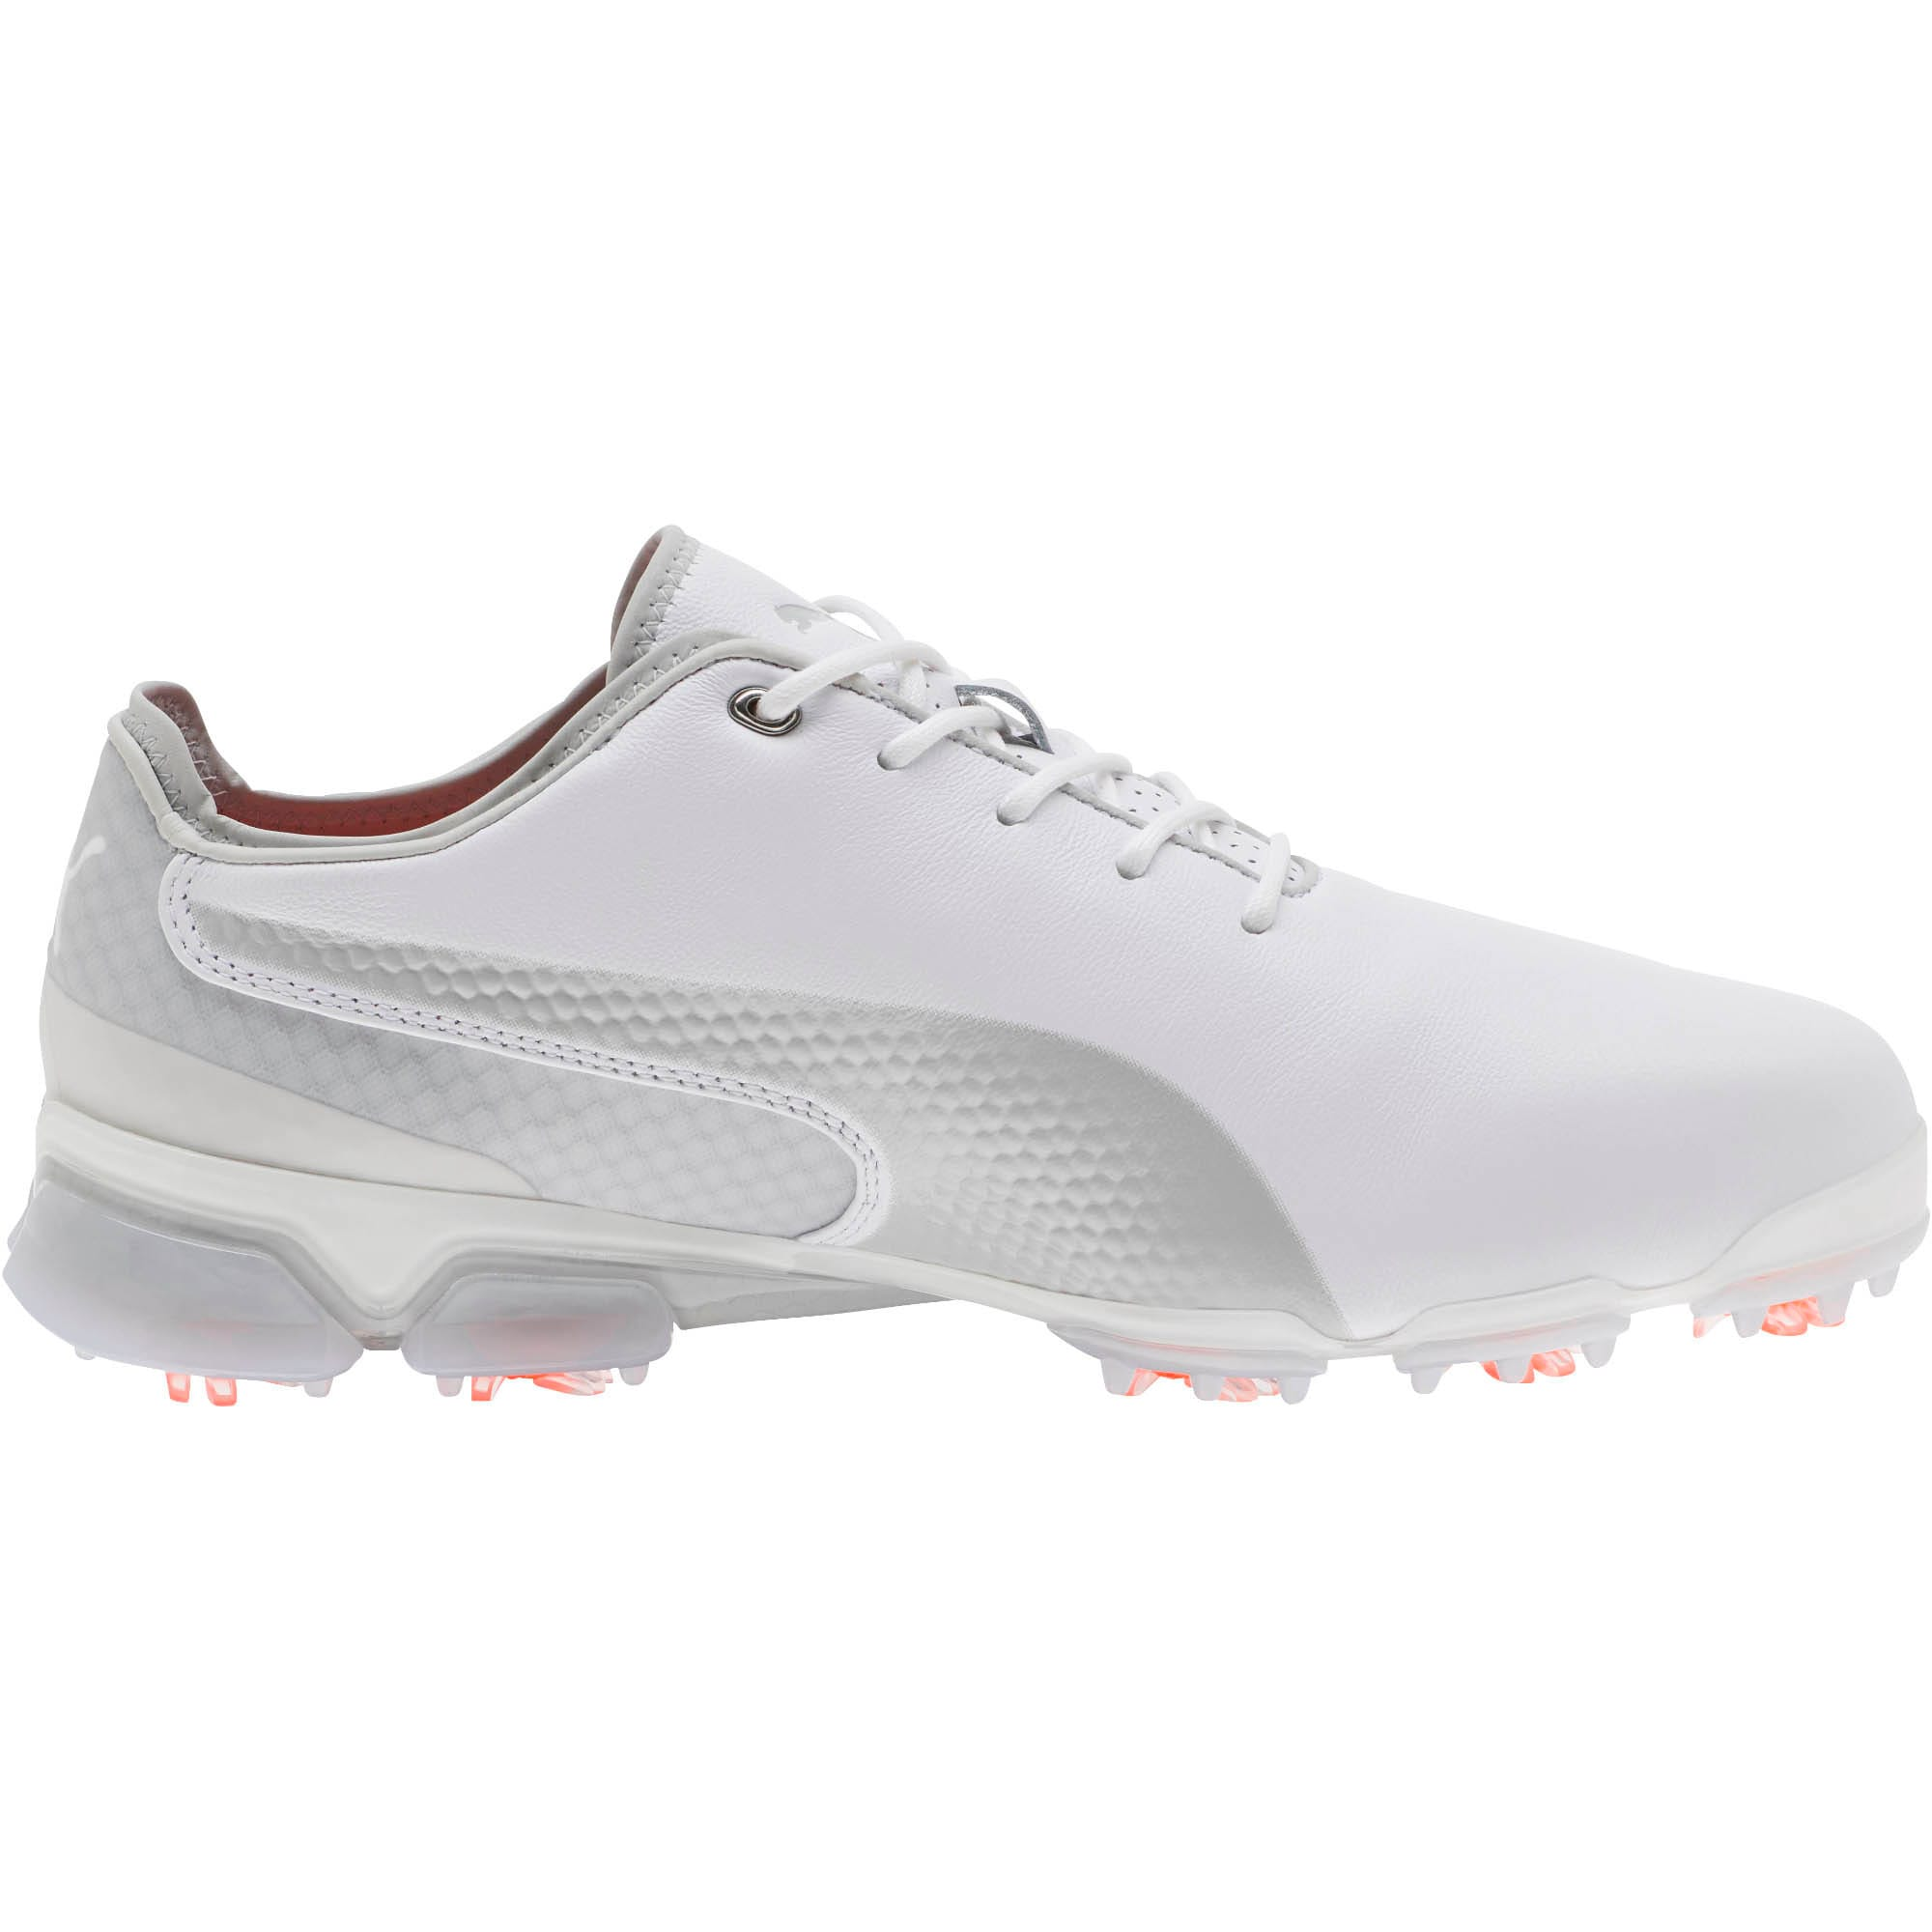 Thumbnail 4 of IGNITE PROADAPT Men's Golf Shoes, White-Gray Violet, medium